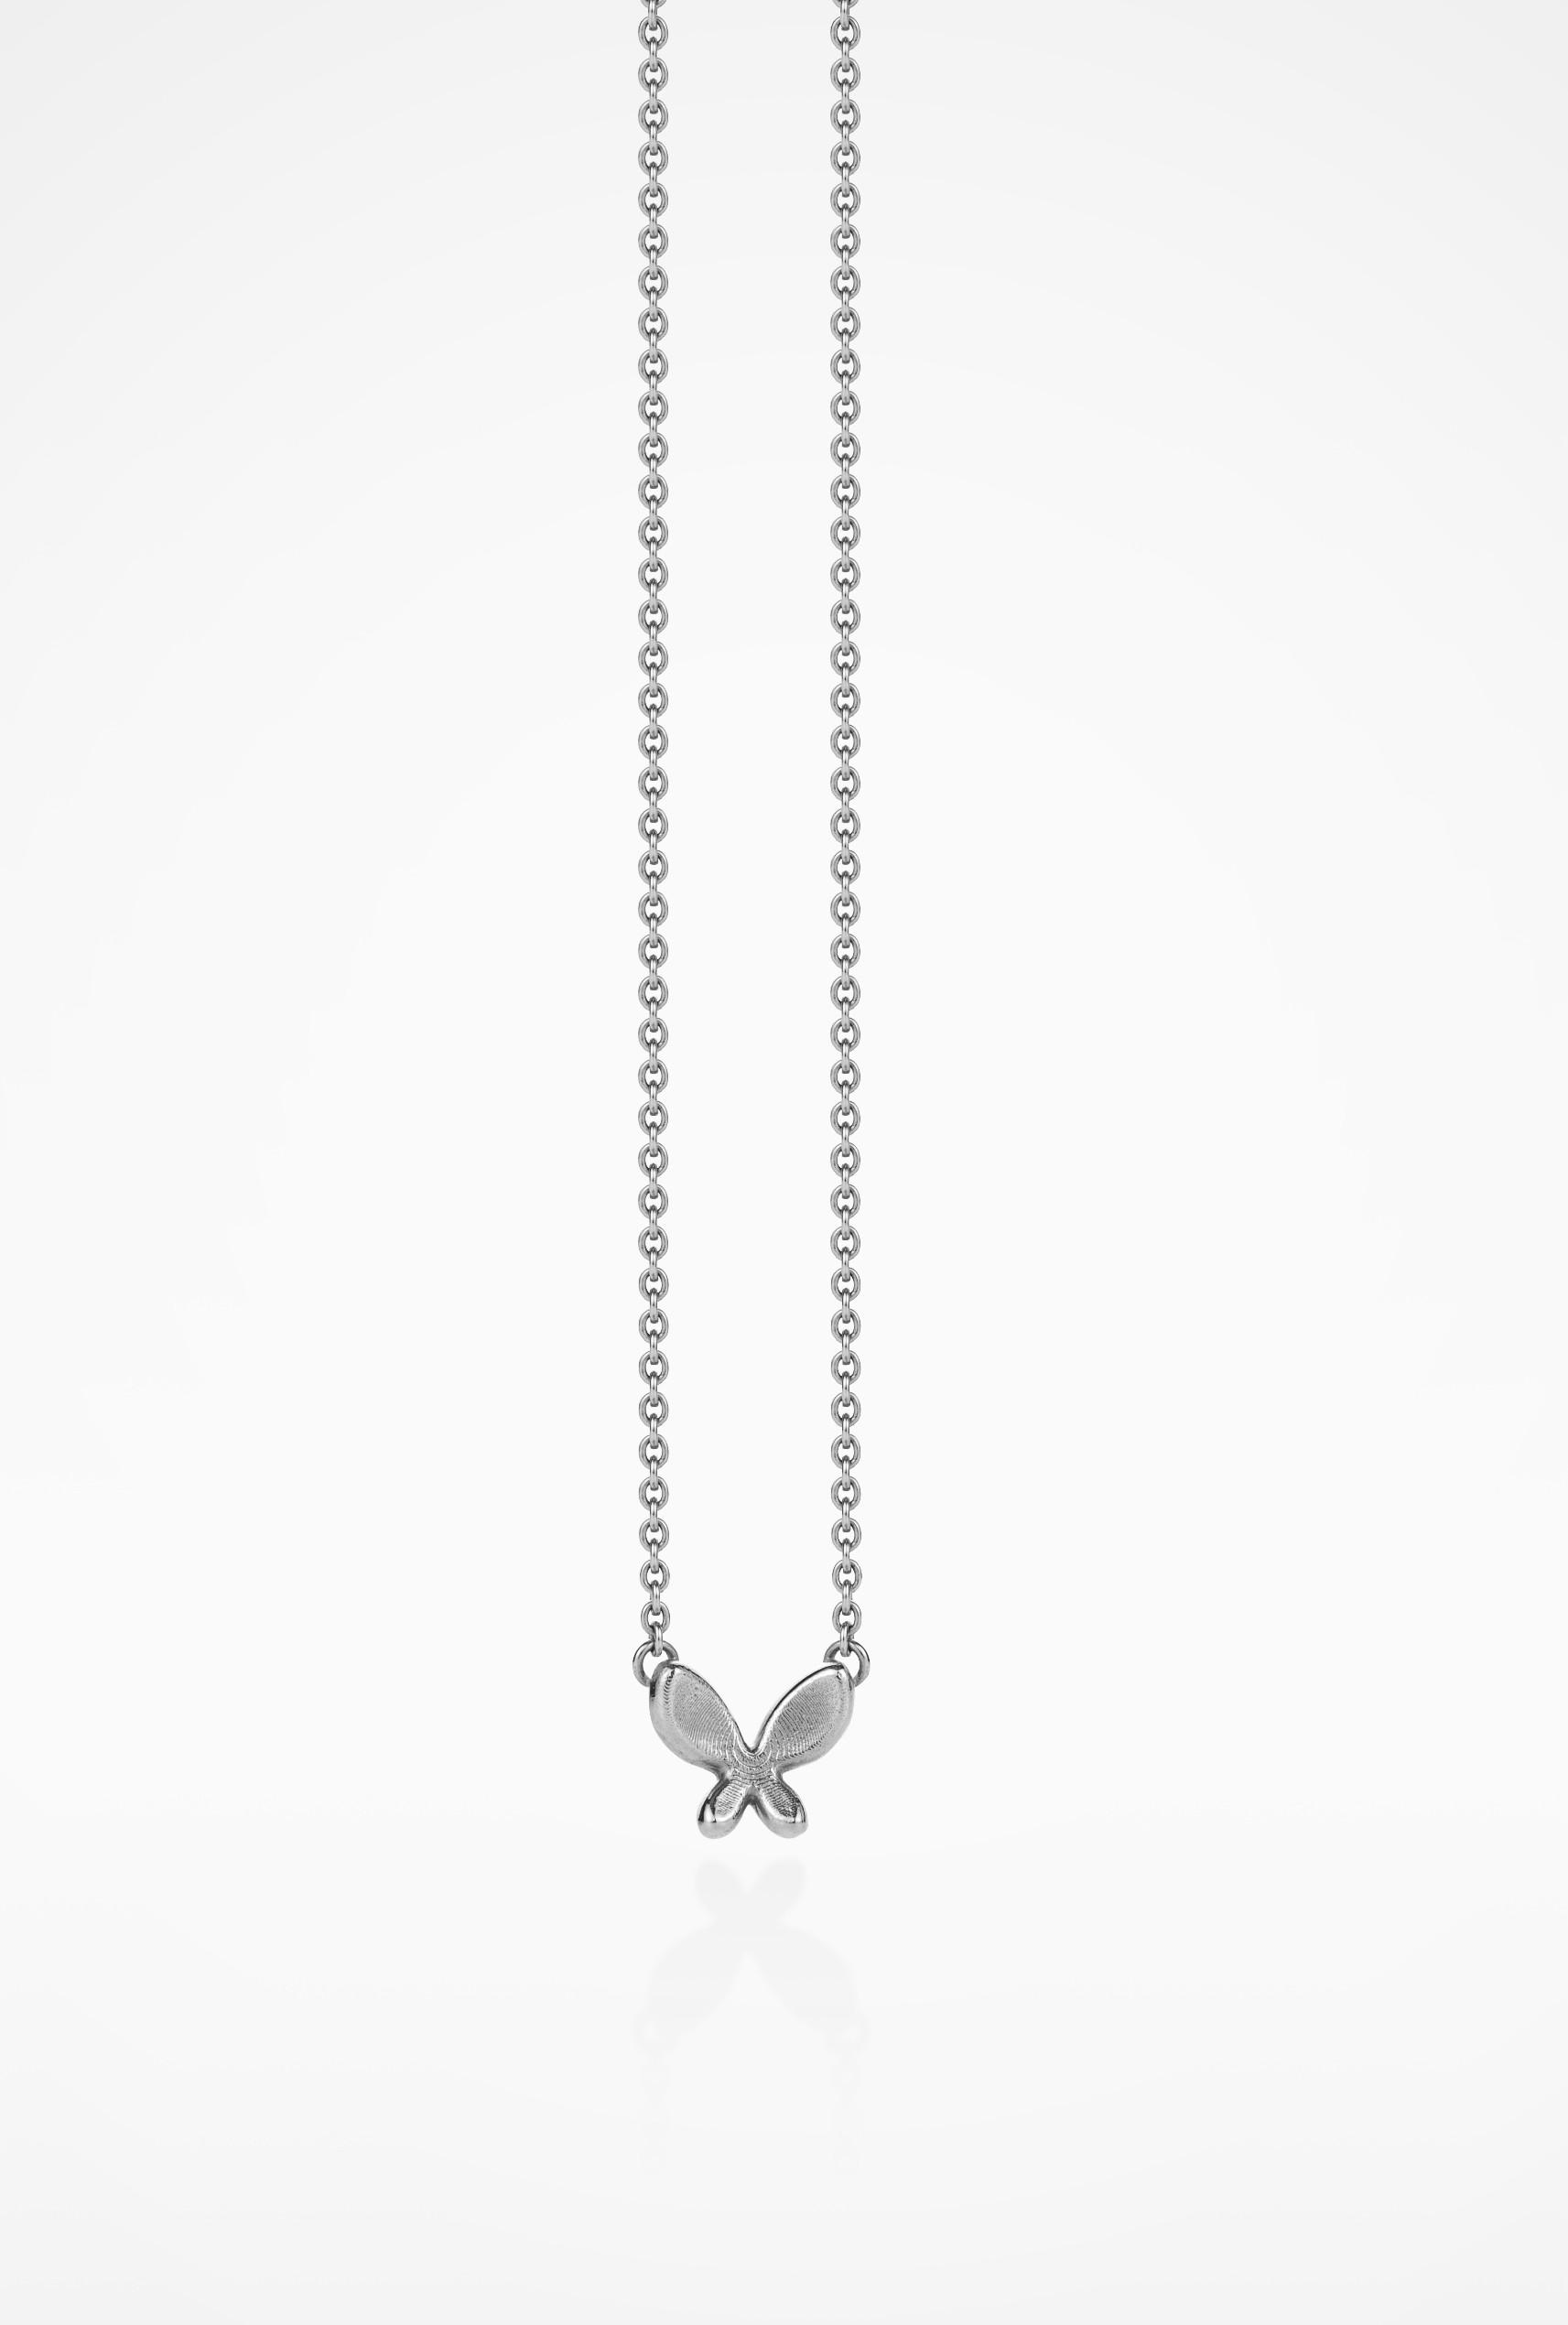 Kreuger Jewellery Amiral Necklace.jpeg